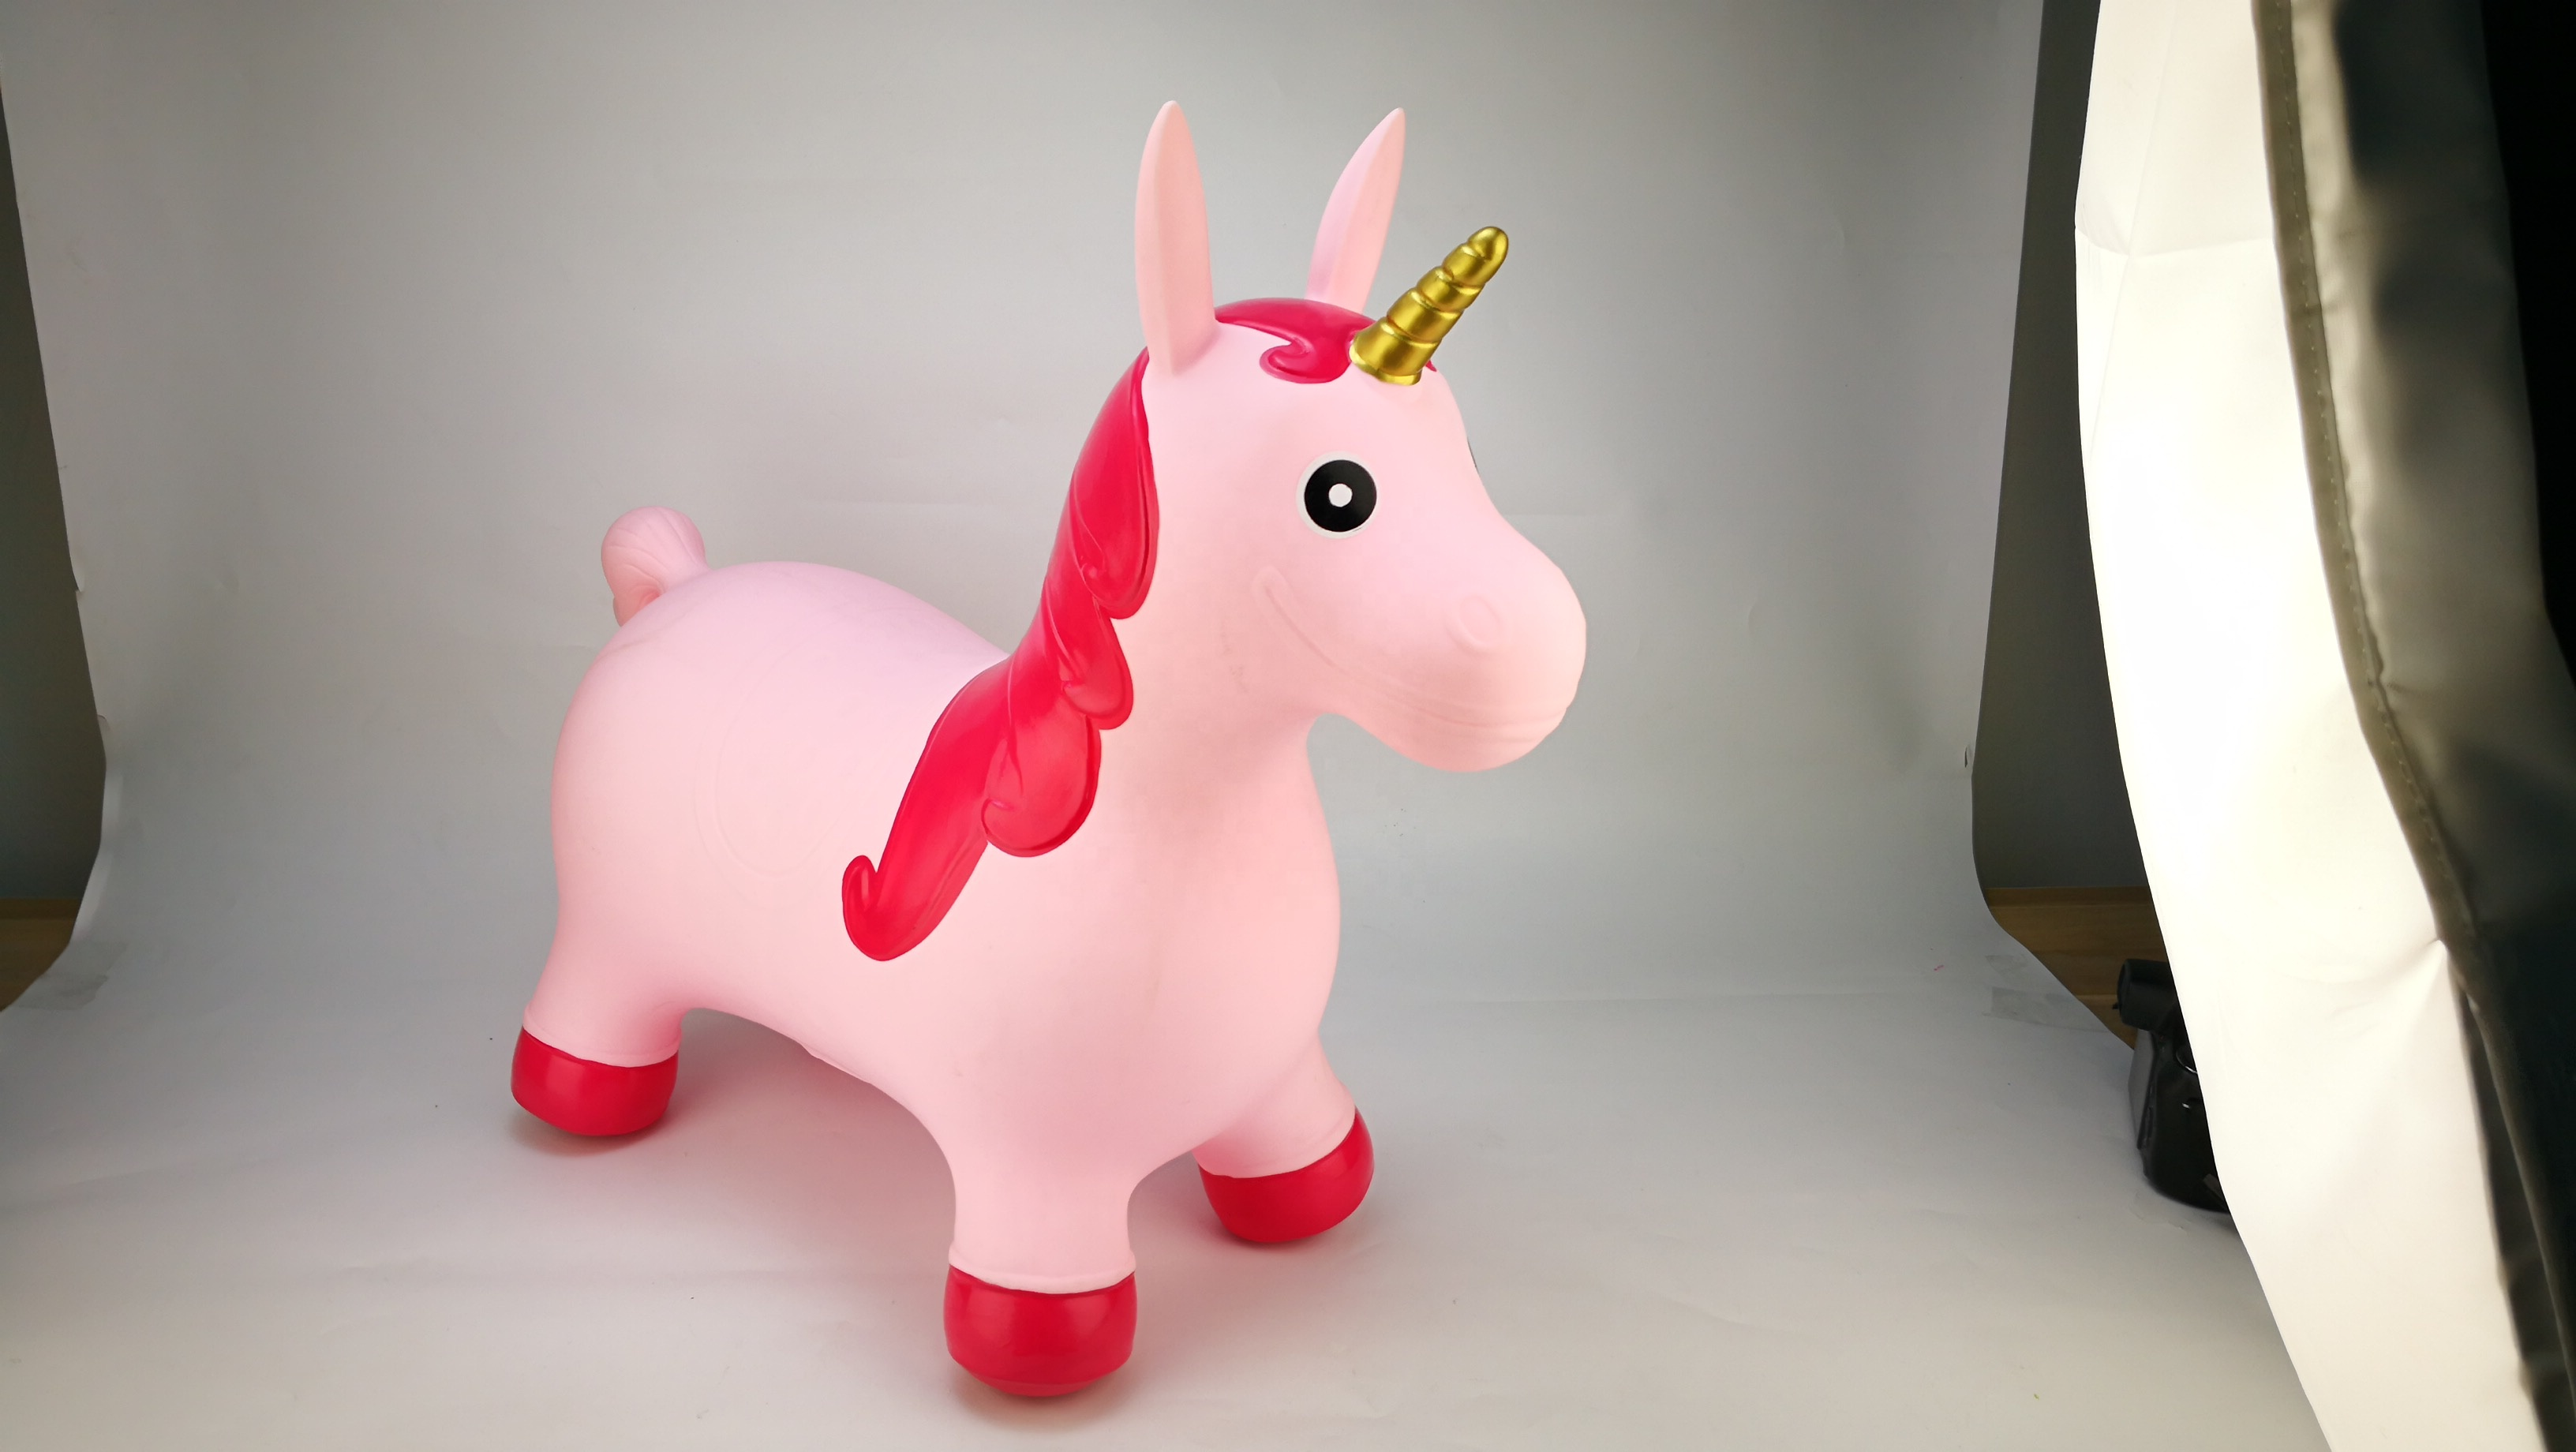 Inflatable unicorn toy for kids ride on unicor animal hopper